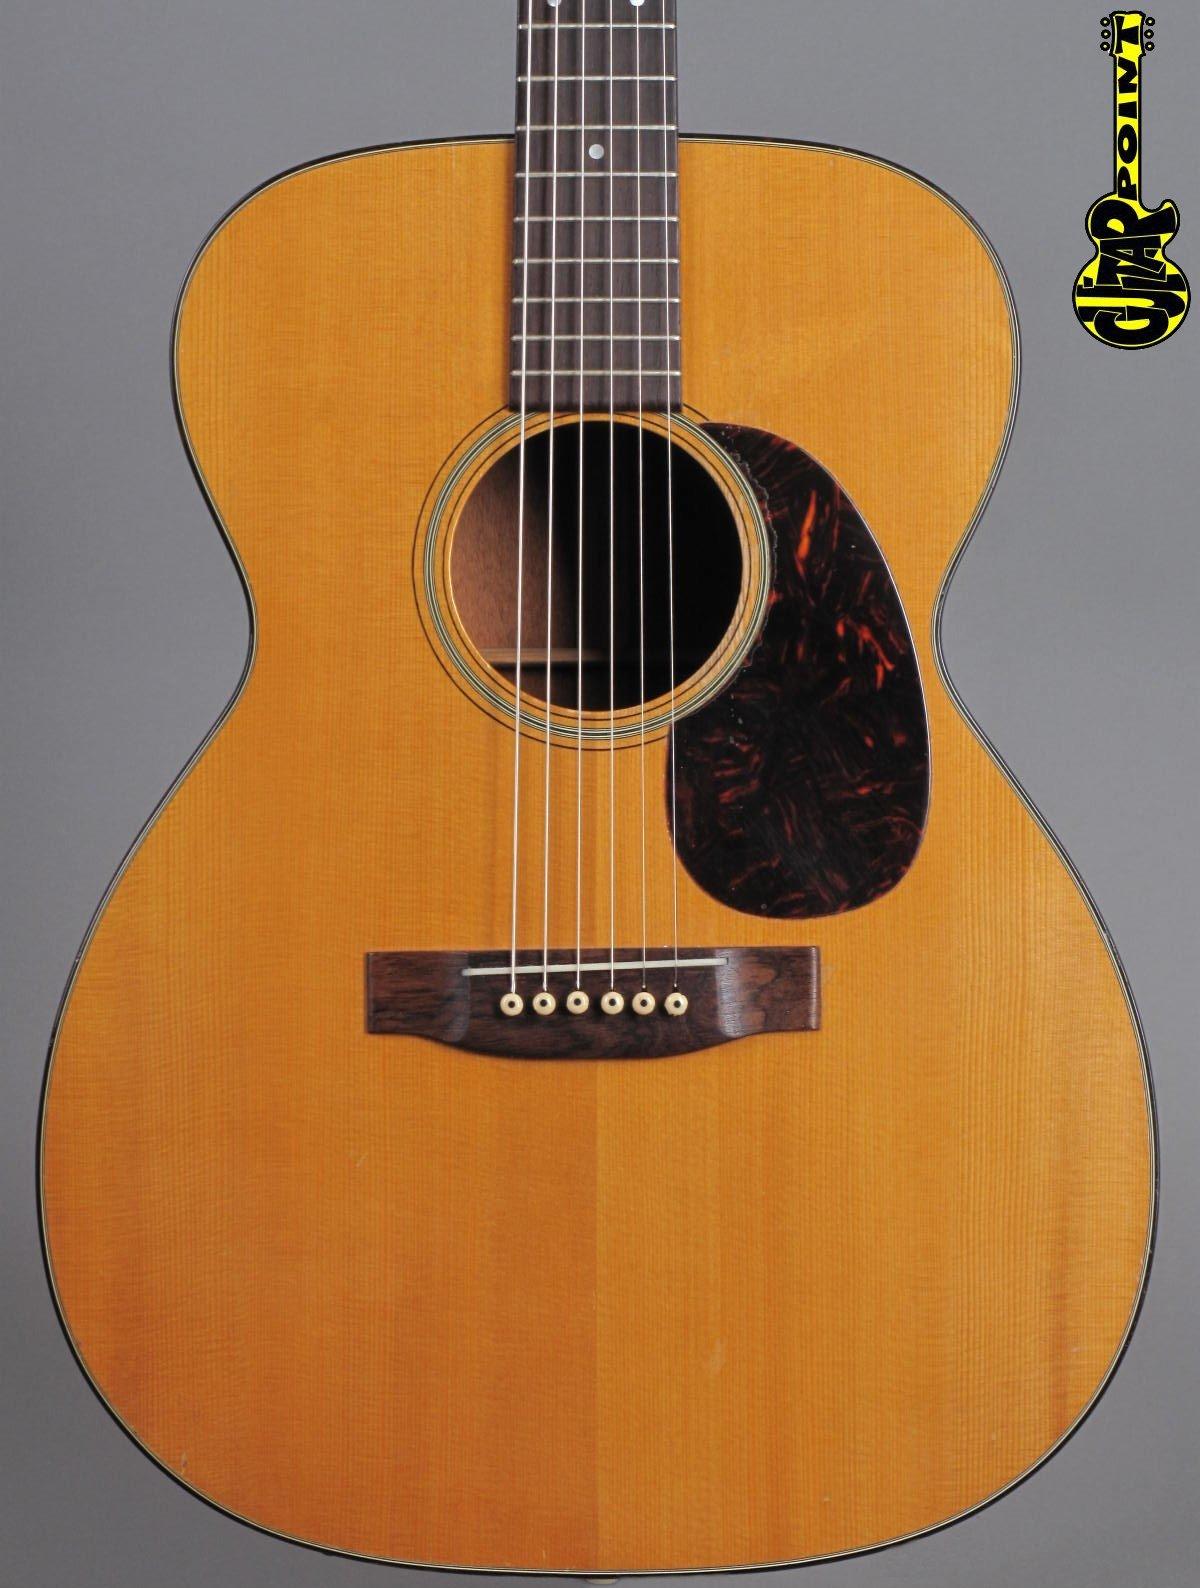 1963 Martin 000-18 - Natural